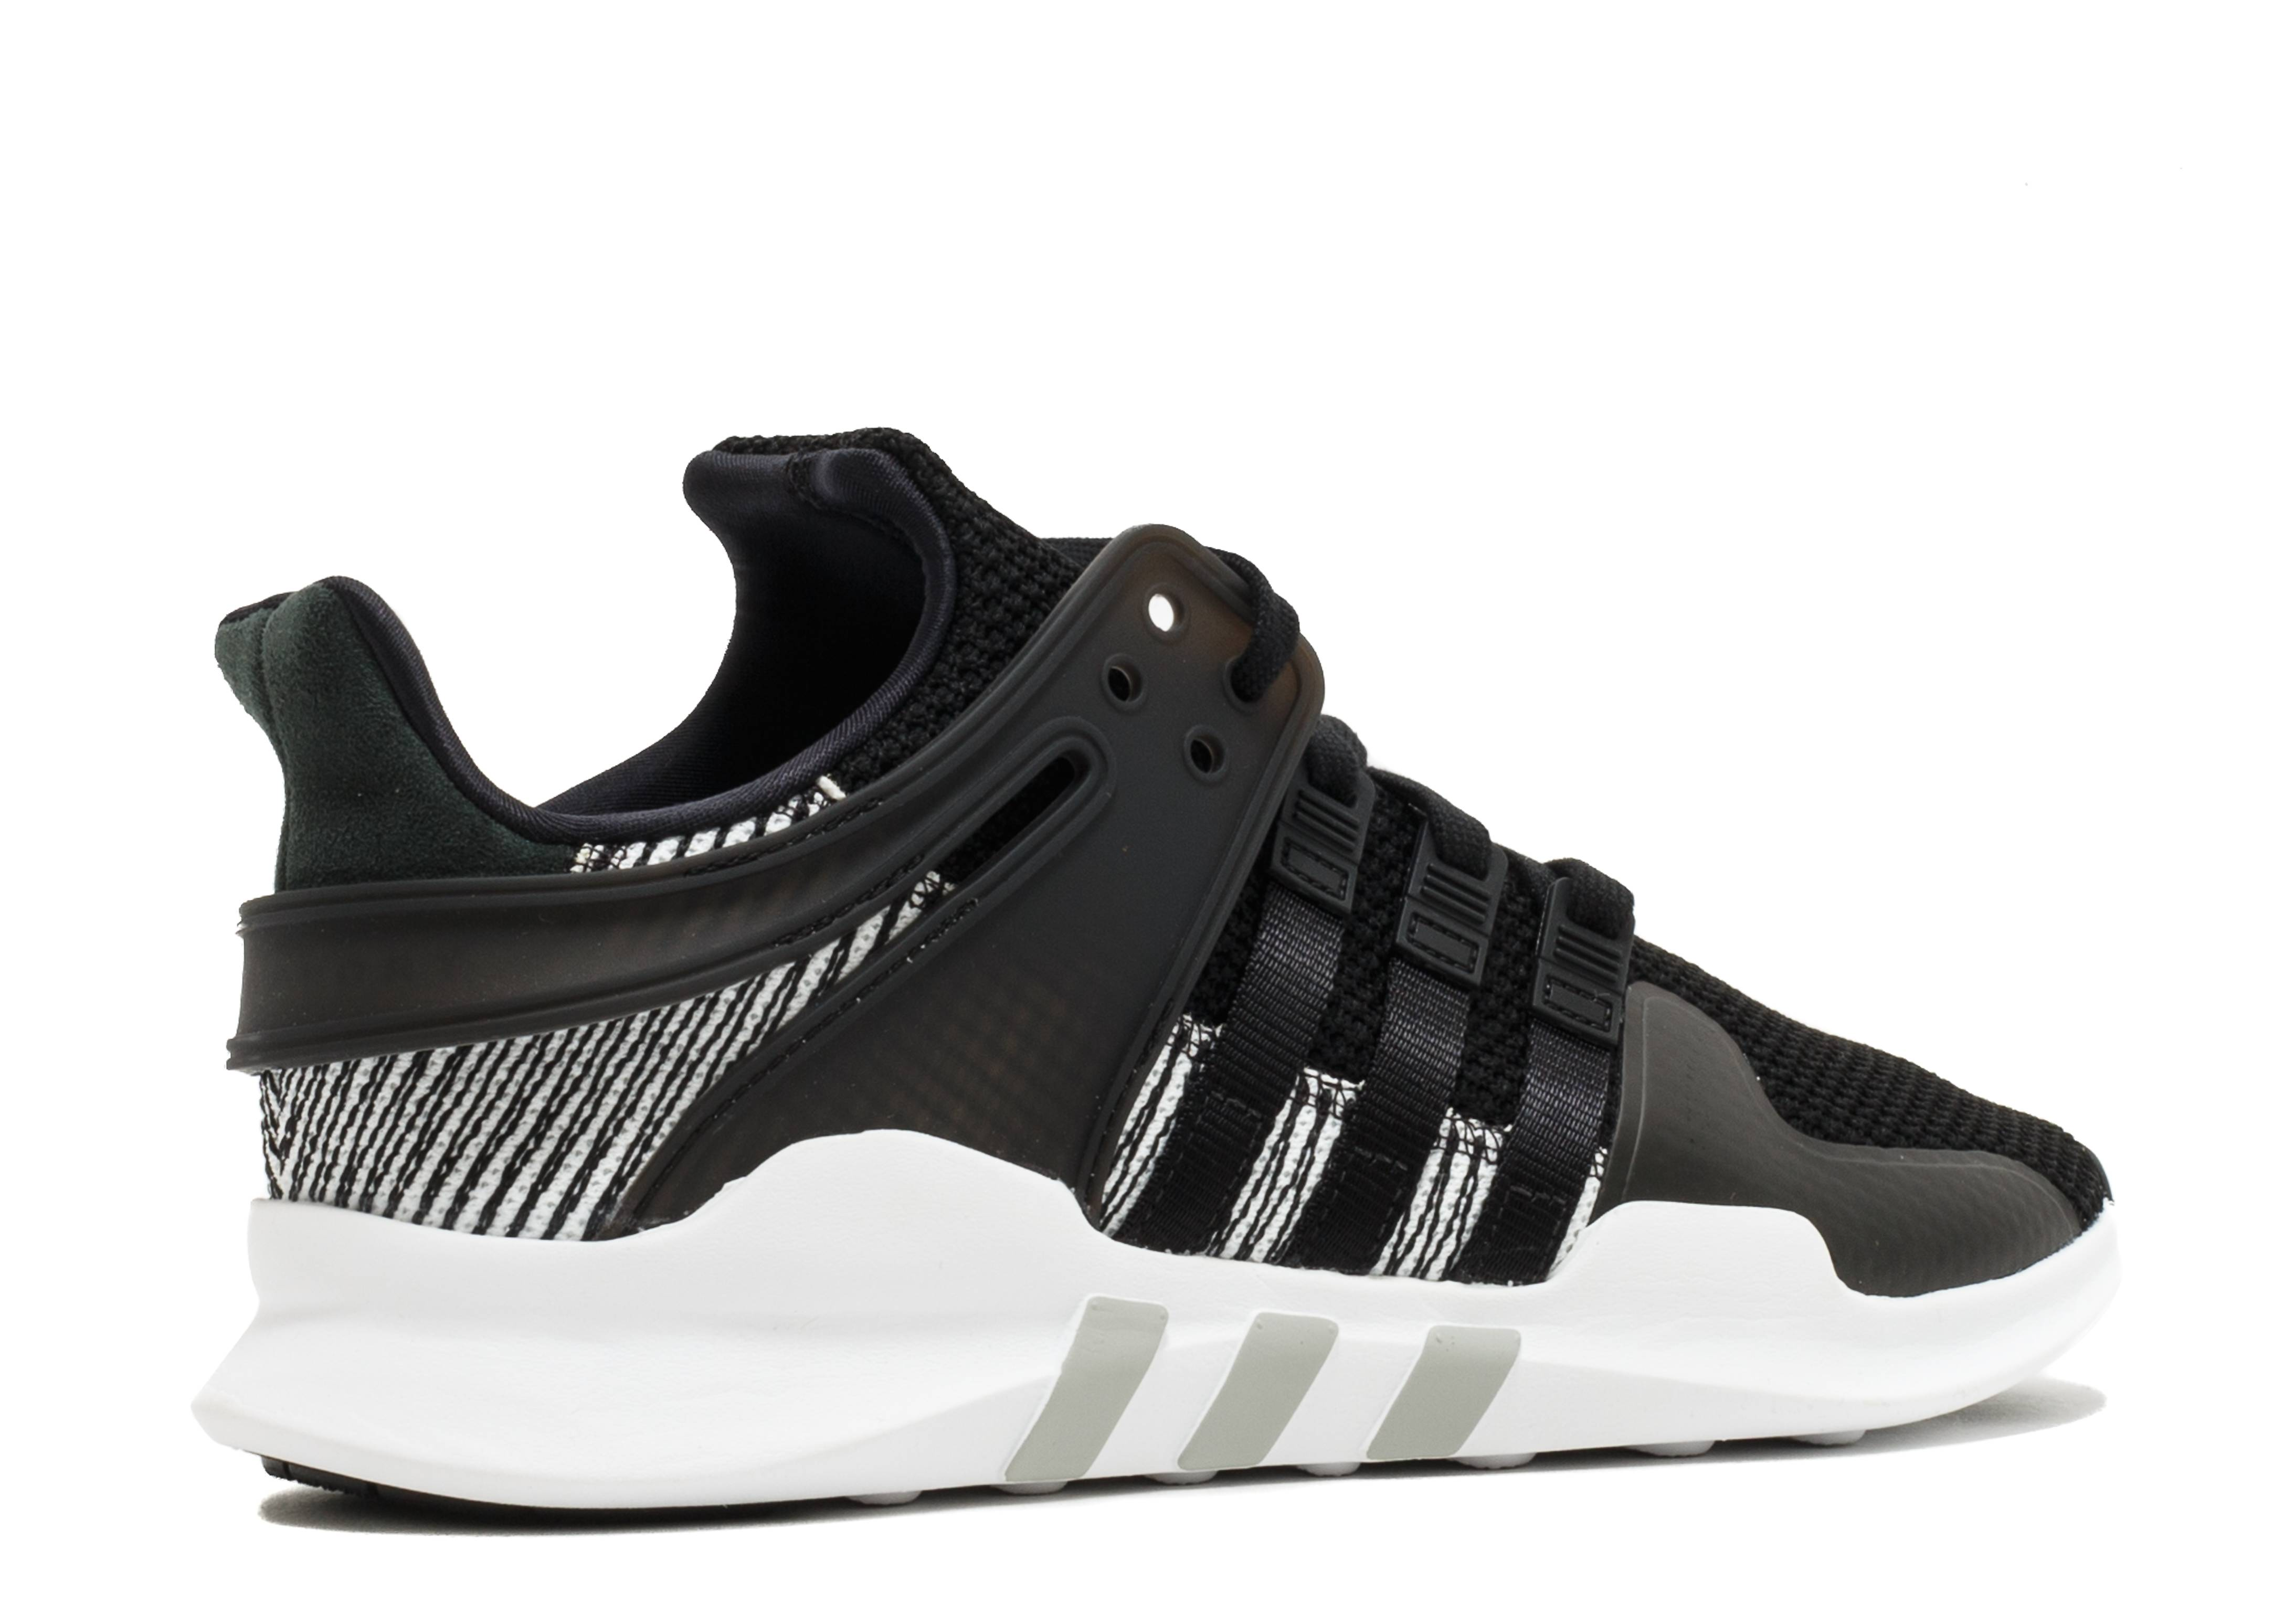 Registro Lucro límite  EQT Support ADV 'Black' - Adidas - BY9585 - core black/footwear white    Flight Club